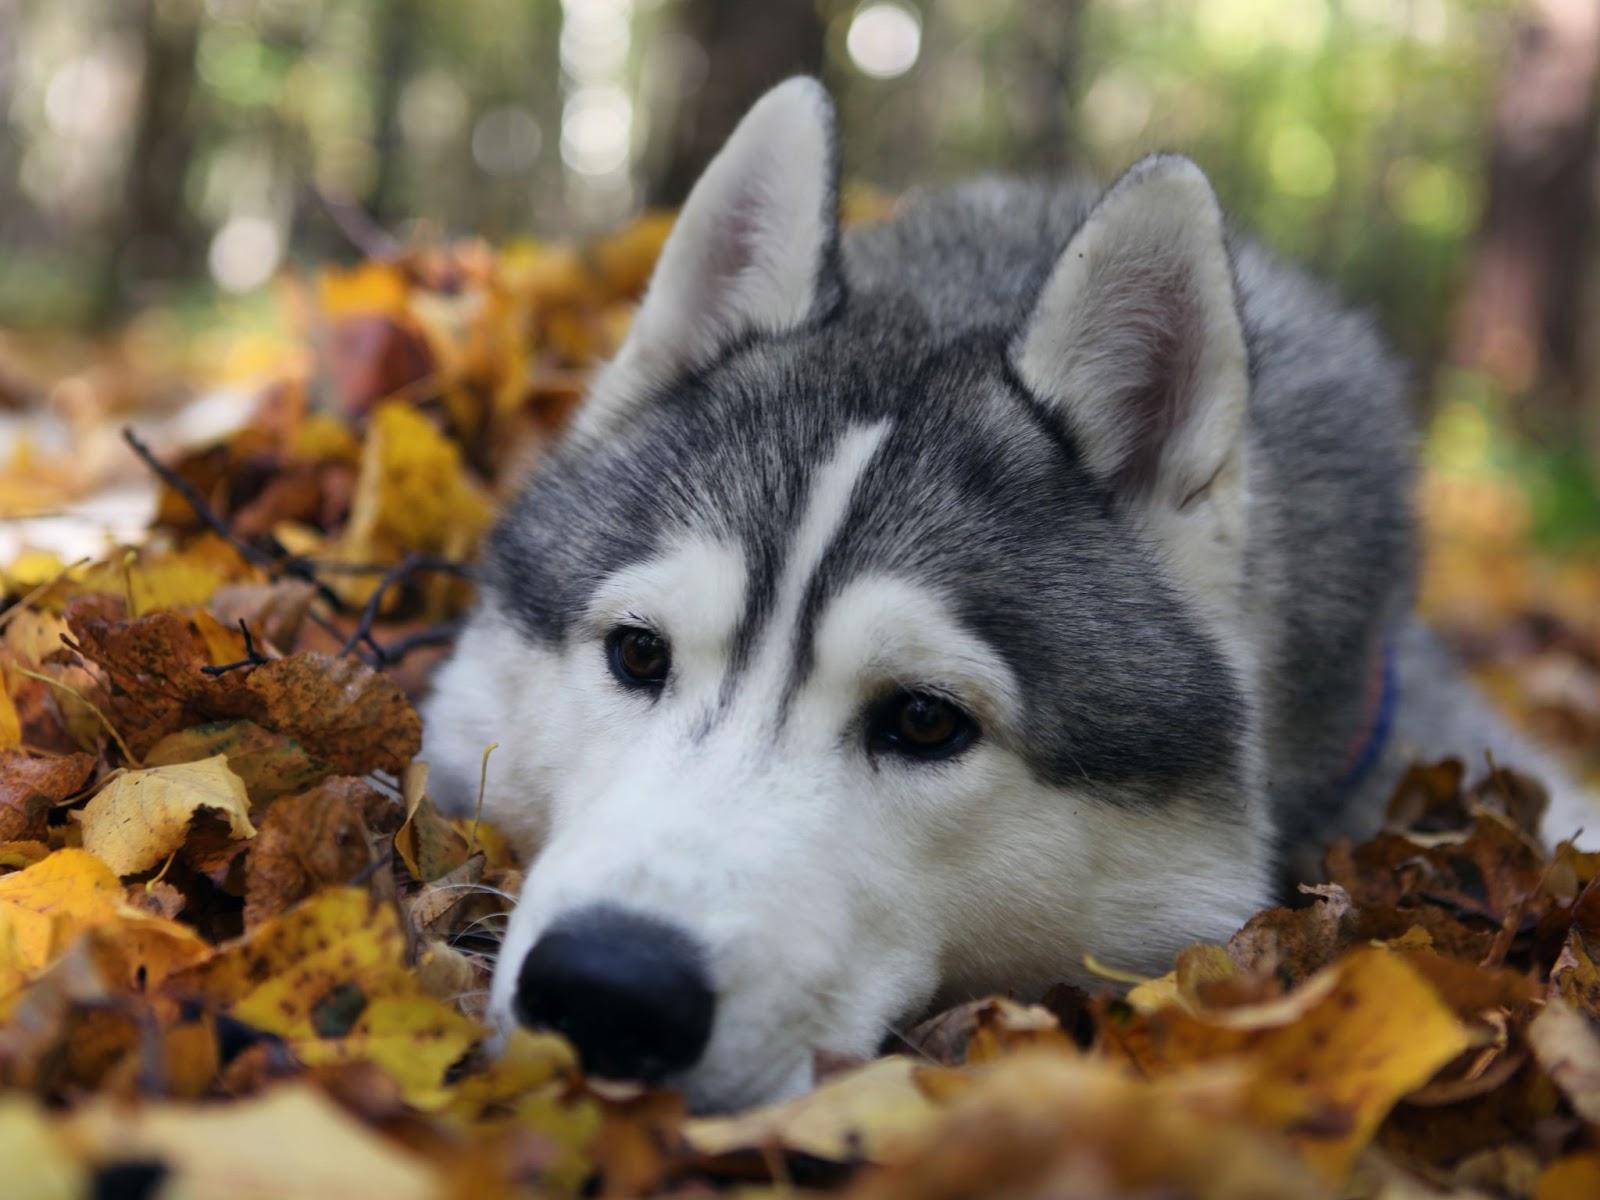 Puppy Wallpaper Free Download